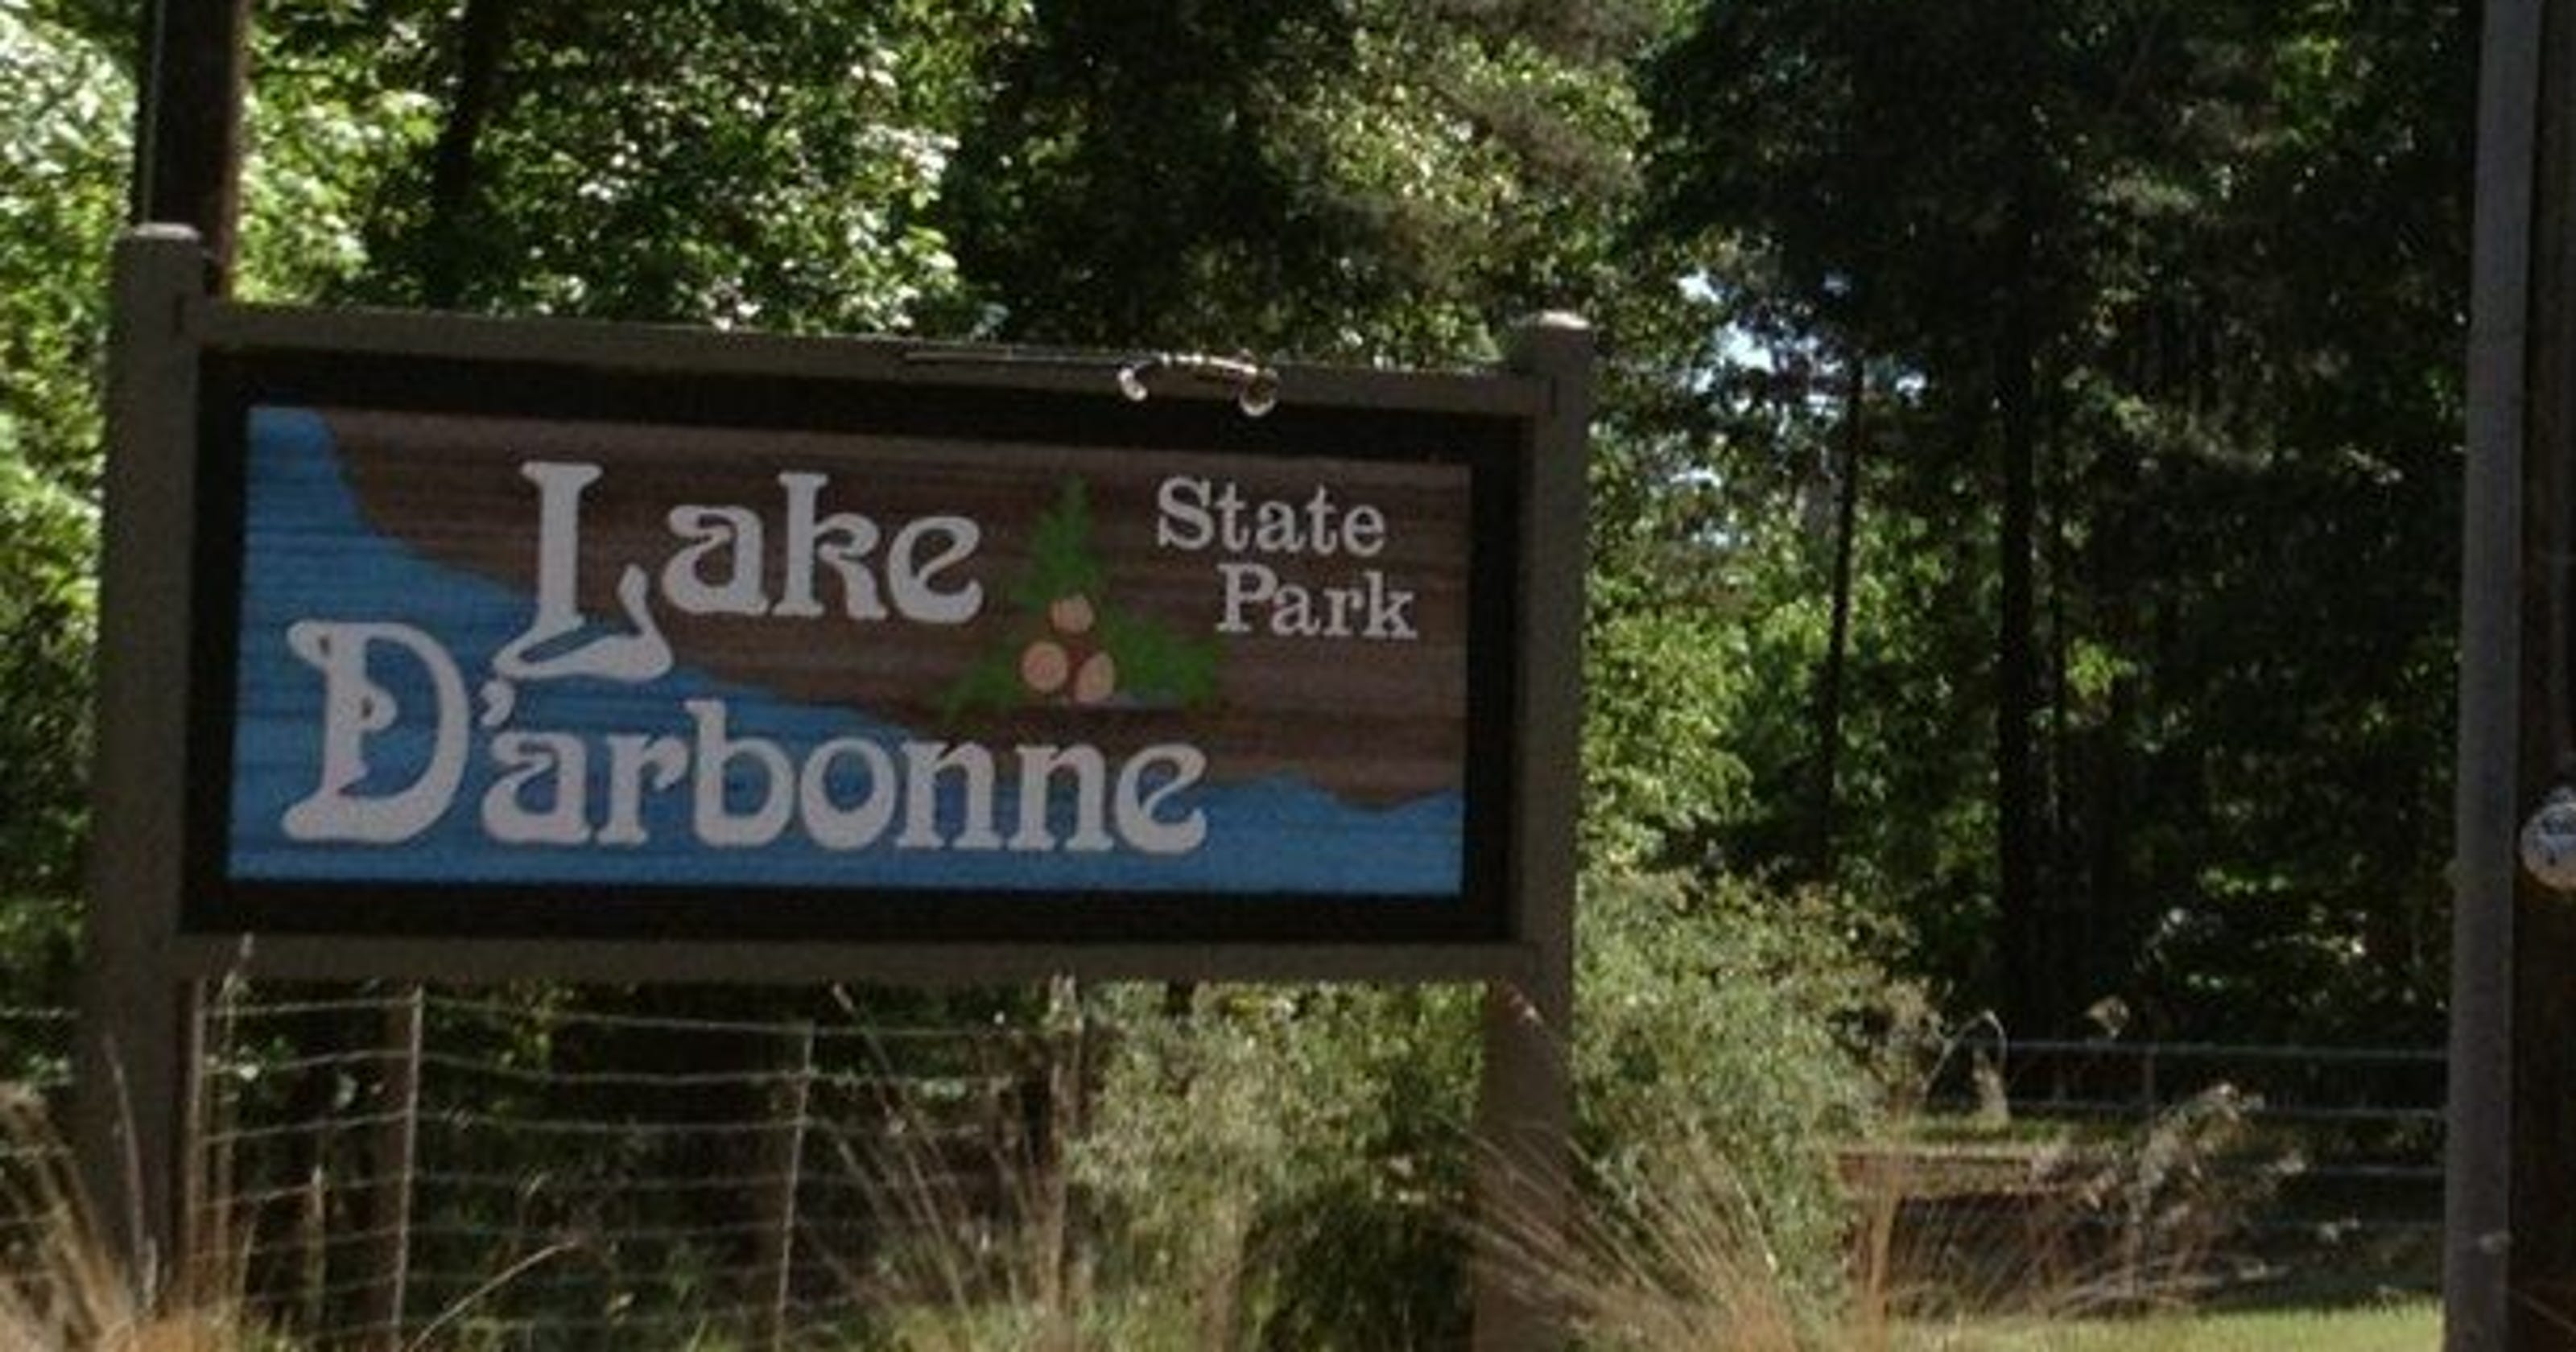 Halloween Hay Ride At Lake Darbonne State Park